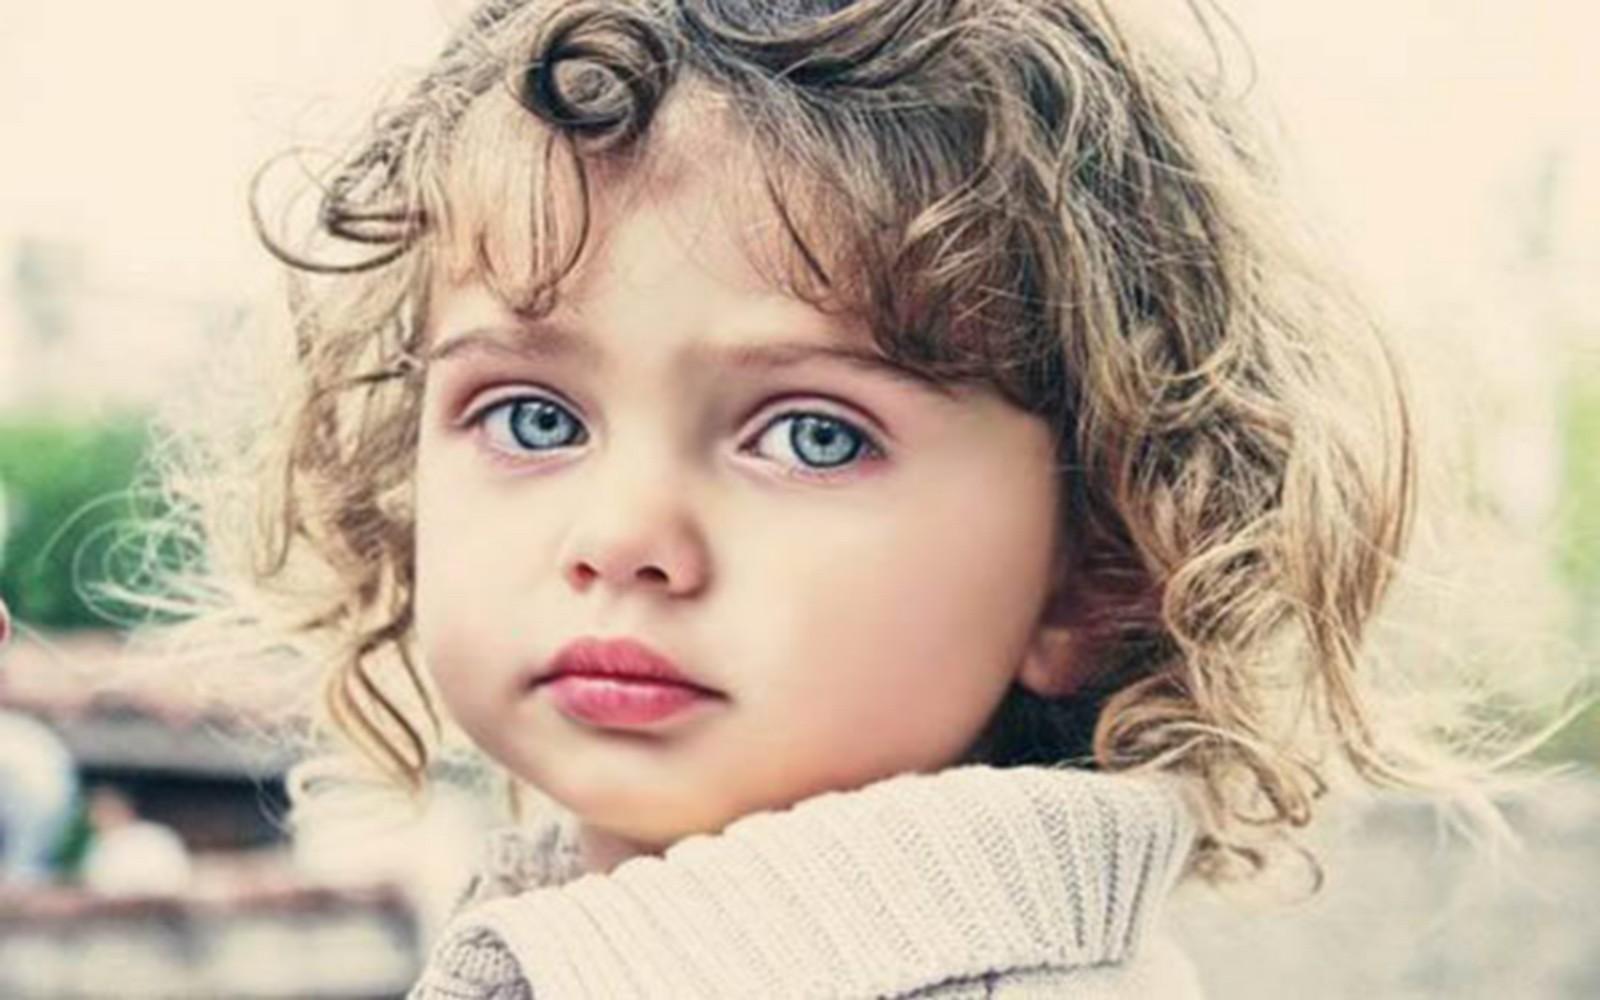 بالصور احلى صور اطفال , اجمل واروع صور اطفال 74860 5